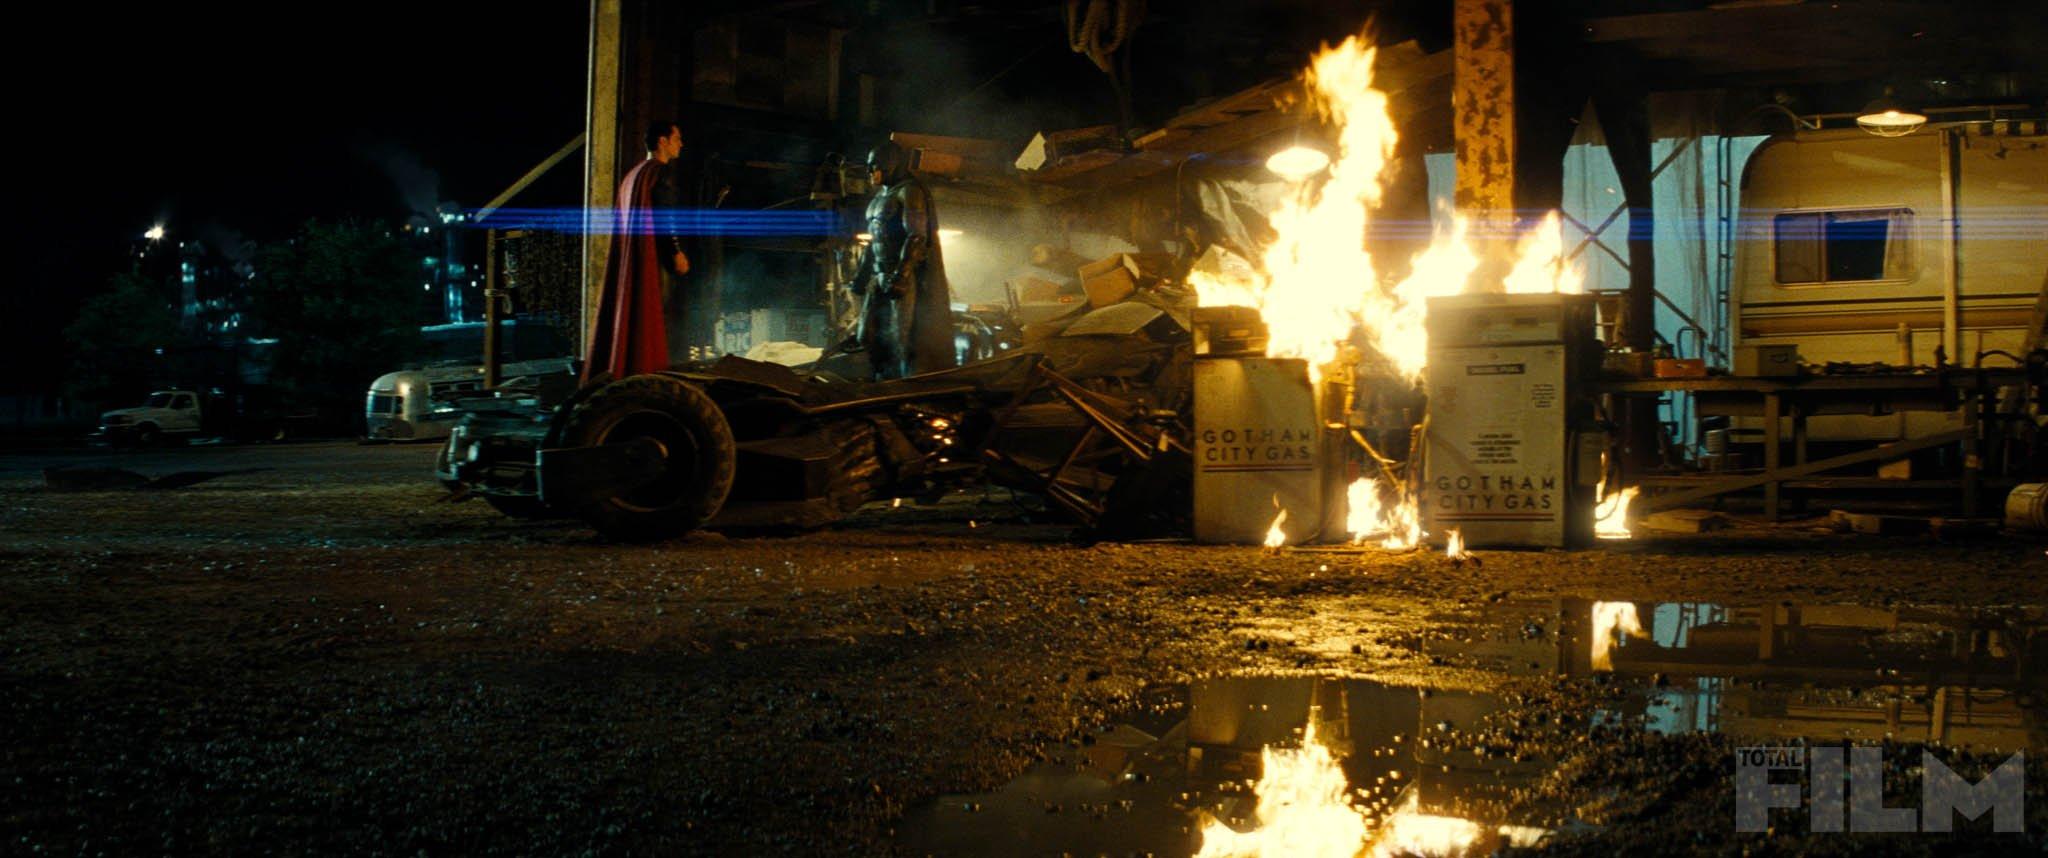 batman-v-superman-total-film-magazine-cover-and-4-photos7